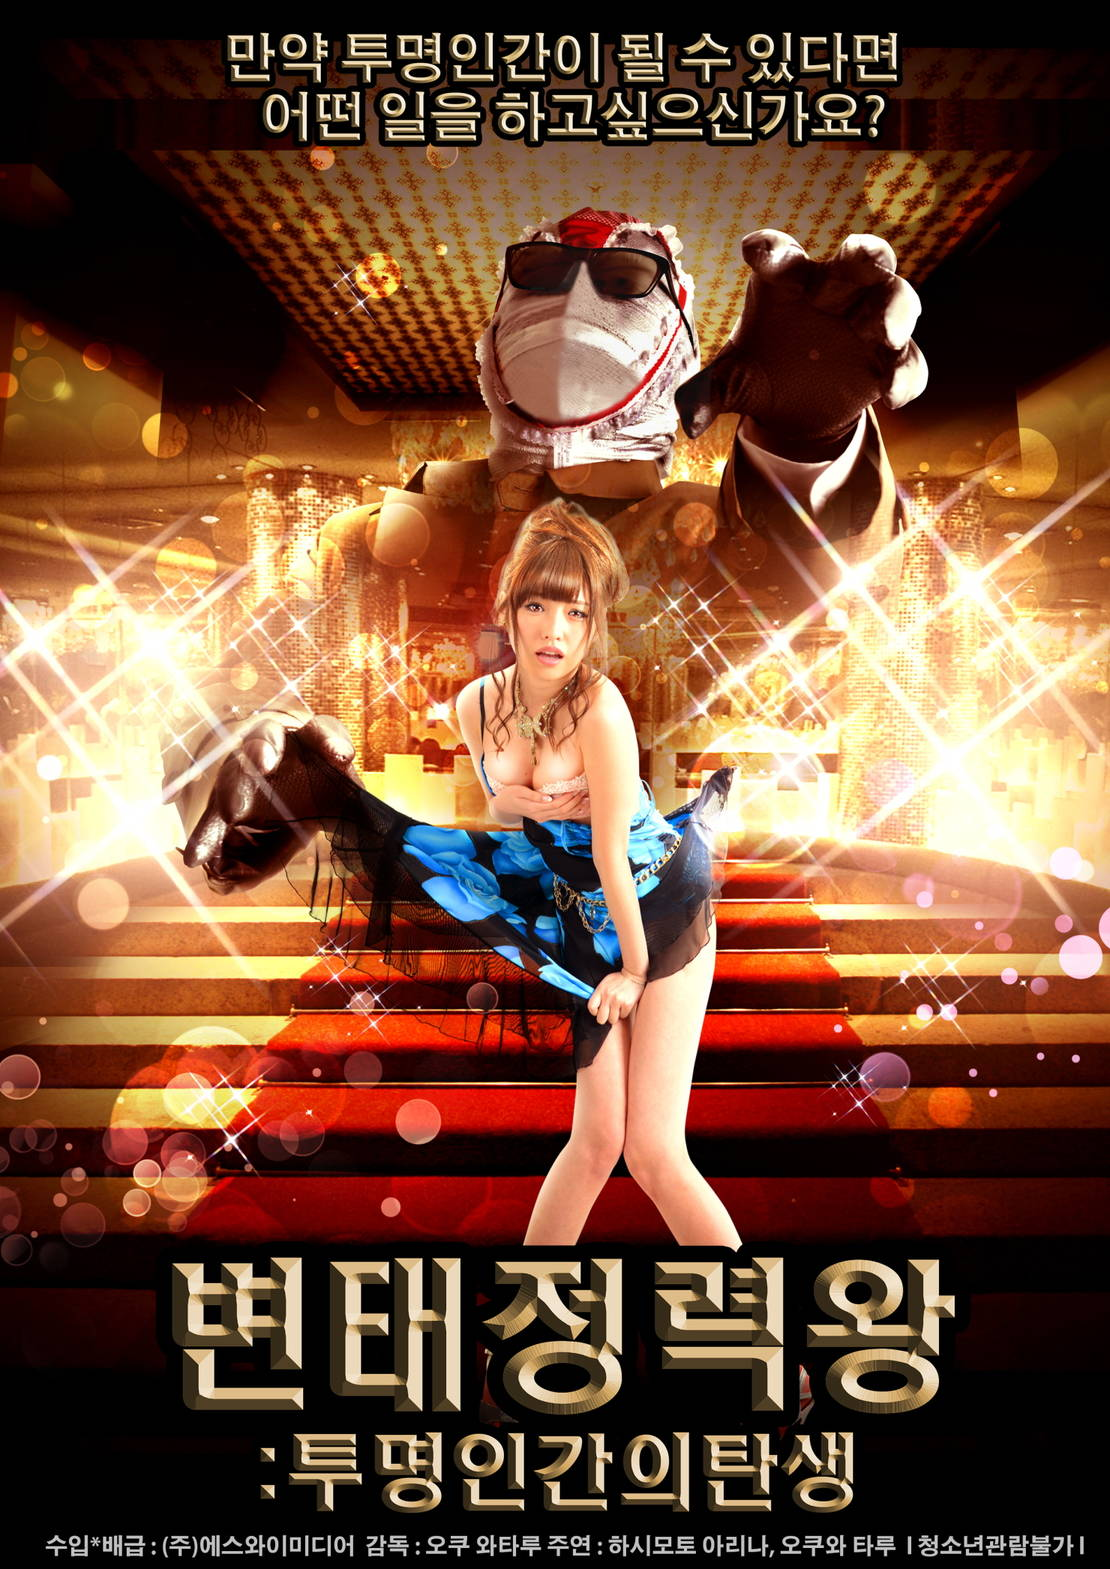 Transformational King: Invisible Man's Birth (2016) [korea 18+]